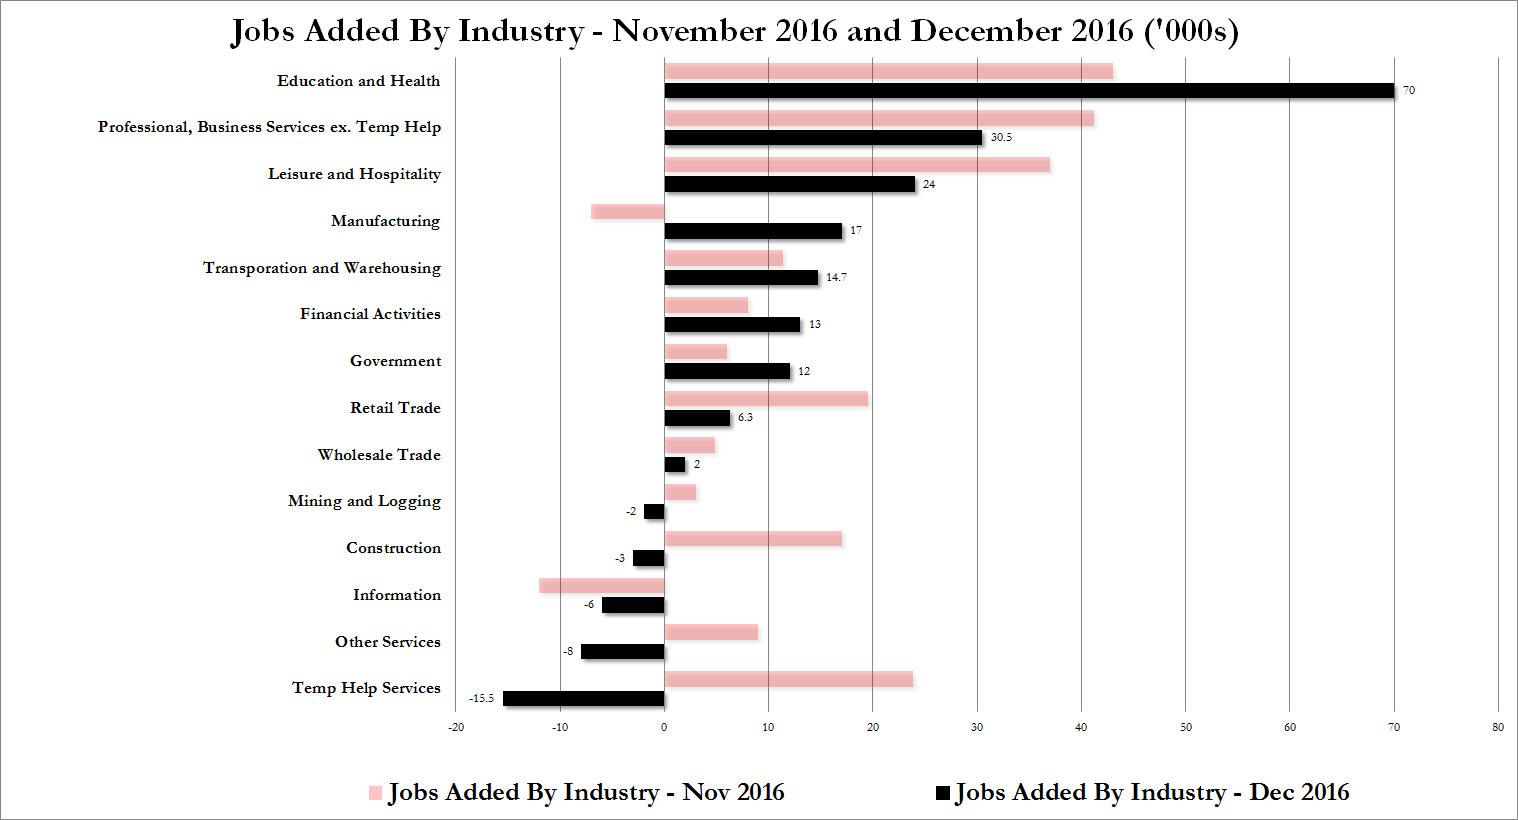 http://icebergfinanza.finanza.com/files/2017/01/where-jobs-were-dec.jpg